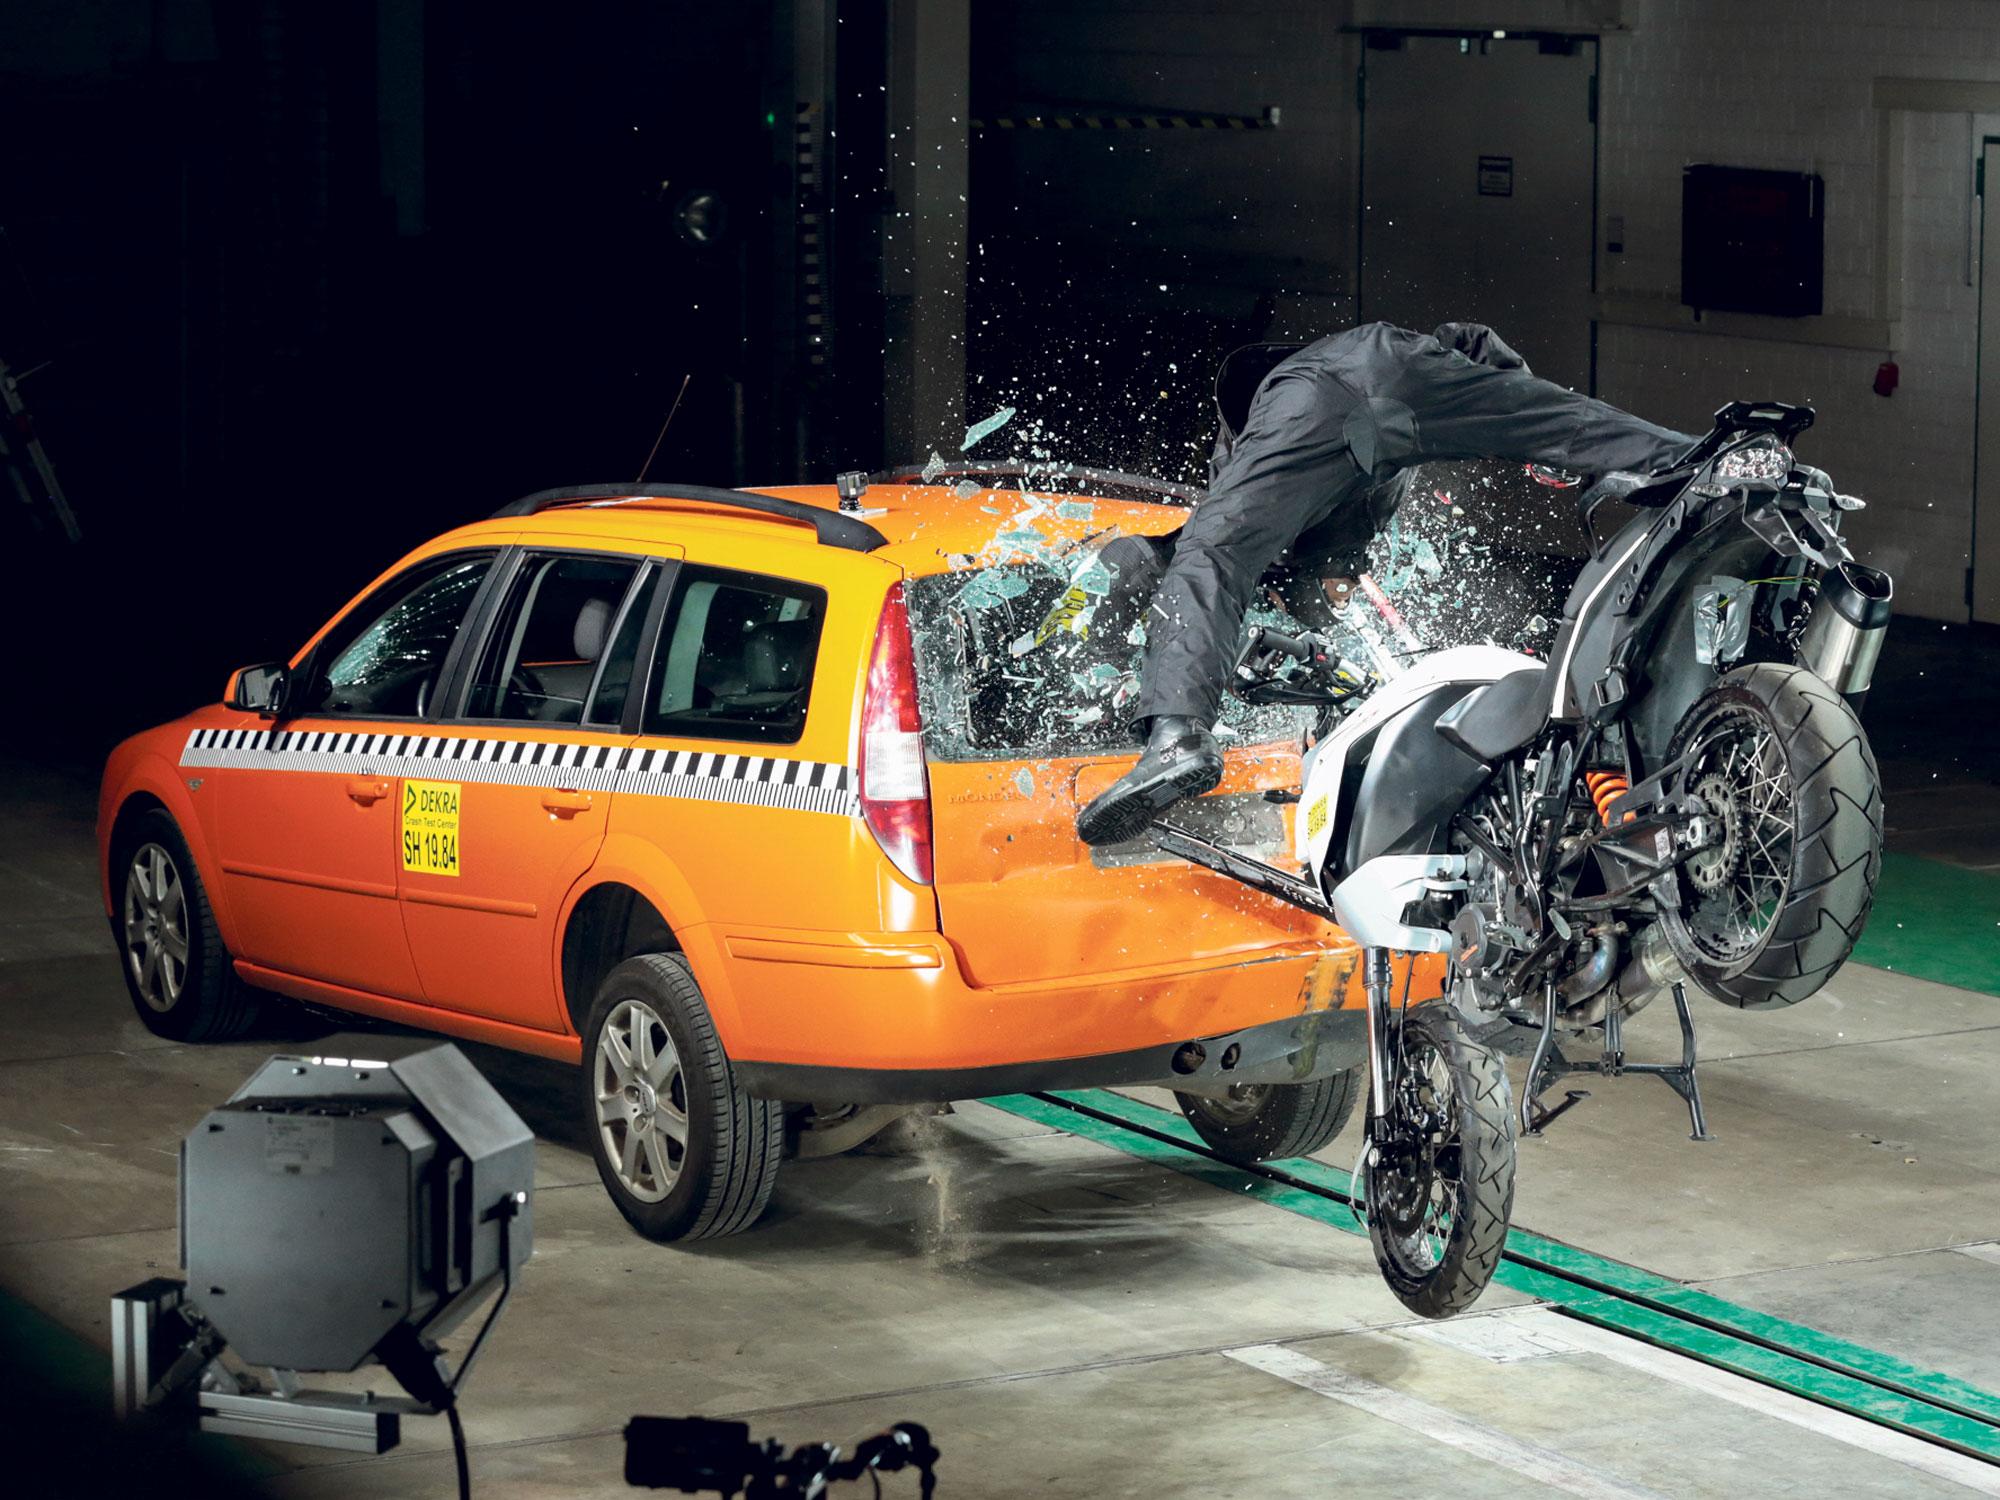 bike-crashing-into-car